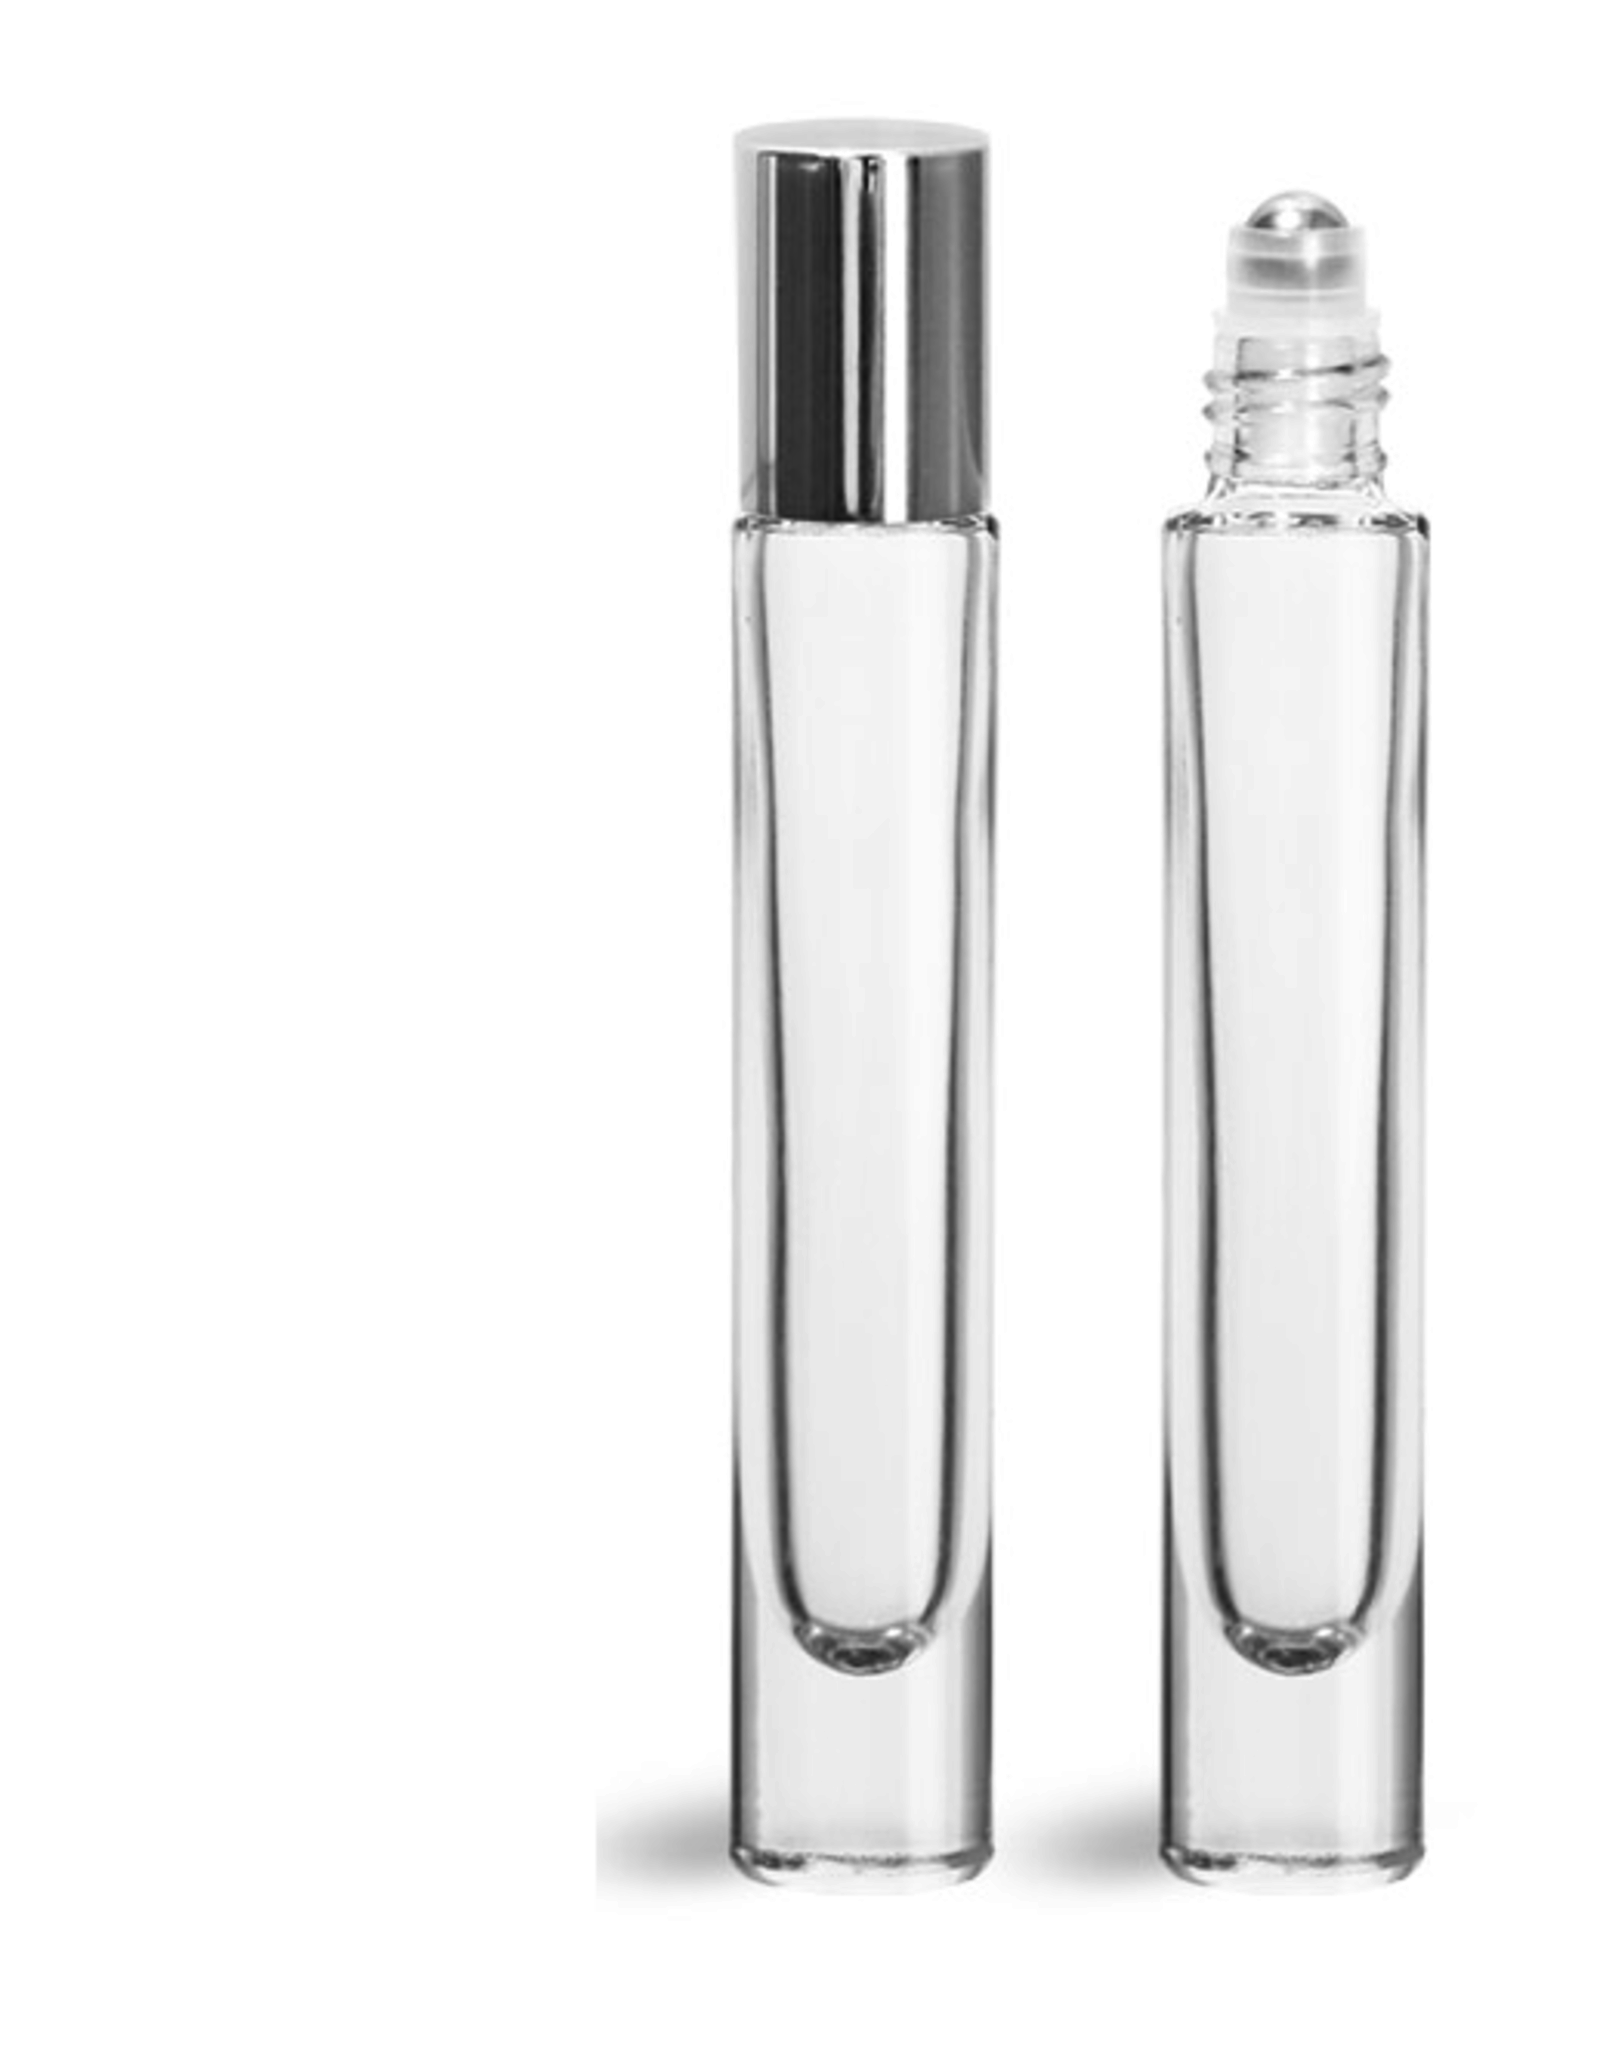 Garden City Essentials Glass Roll On Bottle with Cap - 10 ml